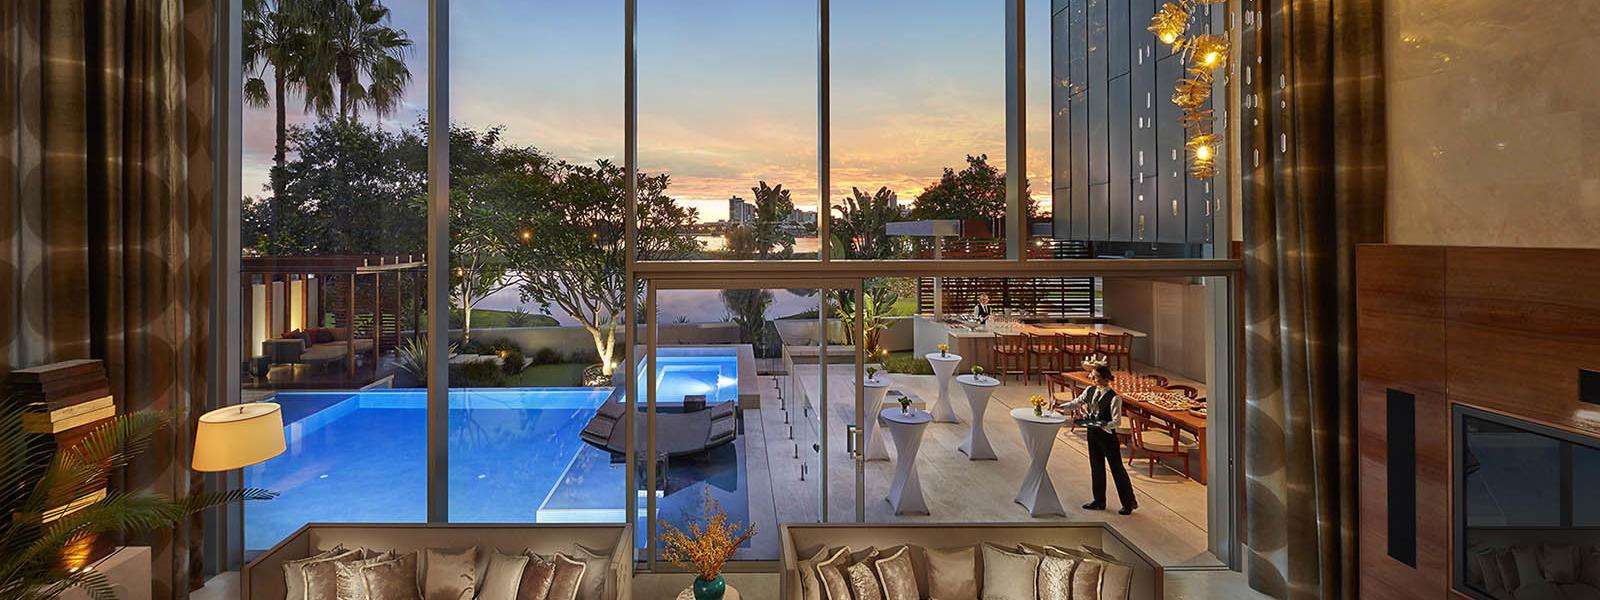 Mansions Meeting Room facilities at Crown Hotel Perth